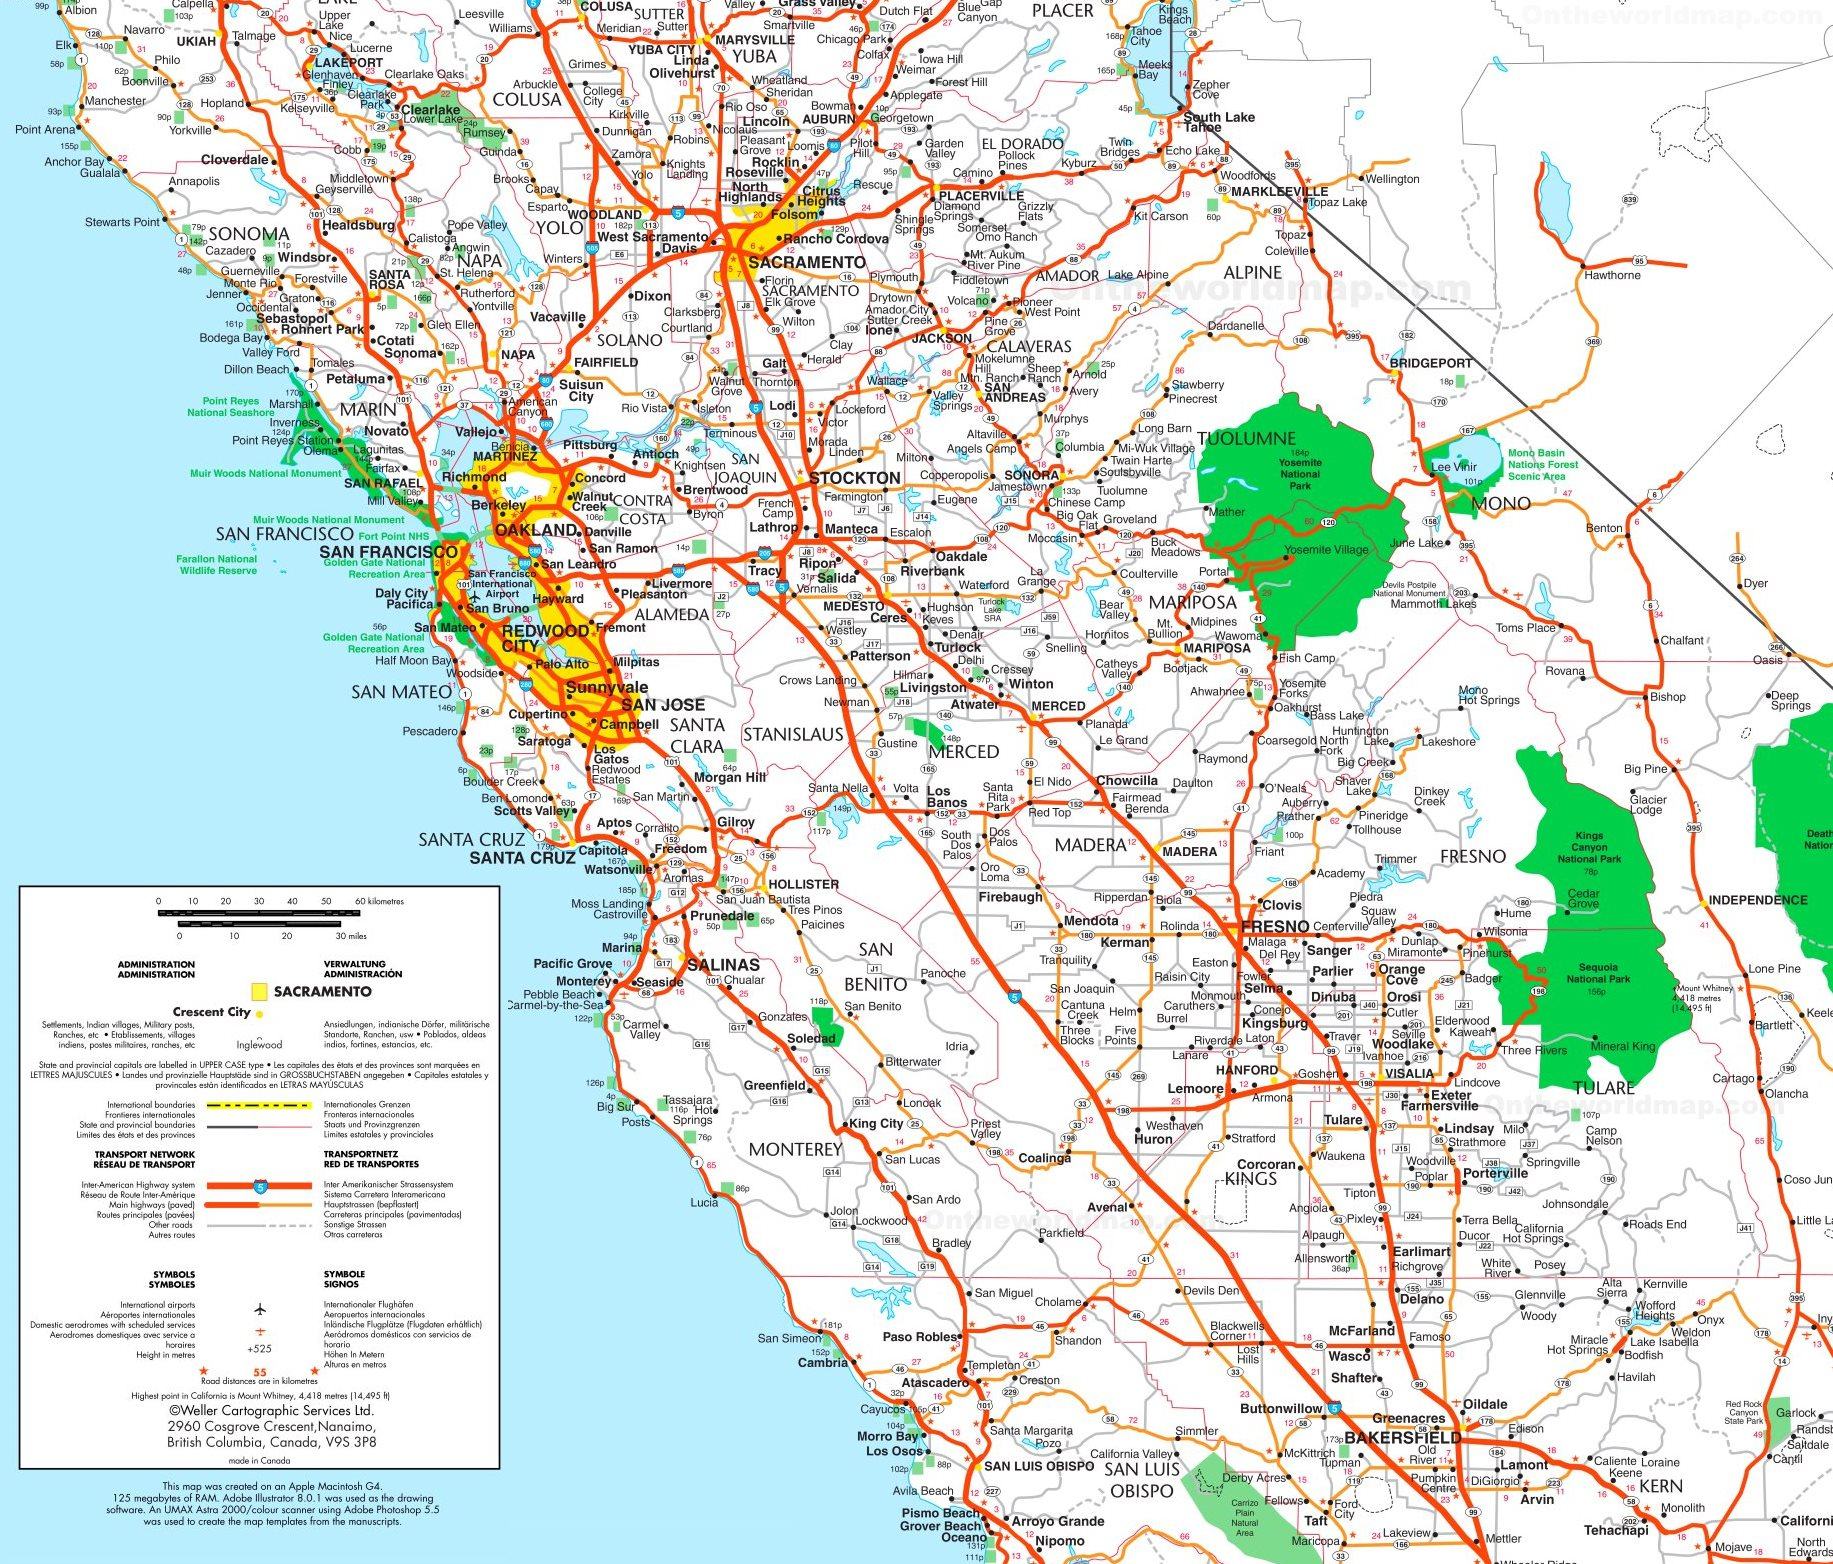 Map Of Central California - Map Of Central California